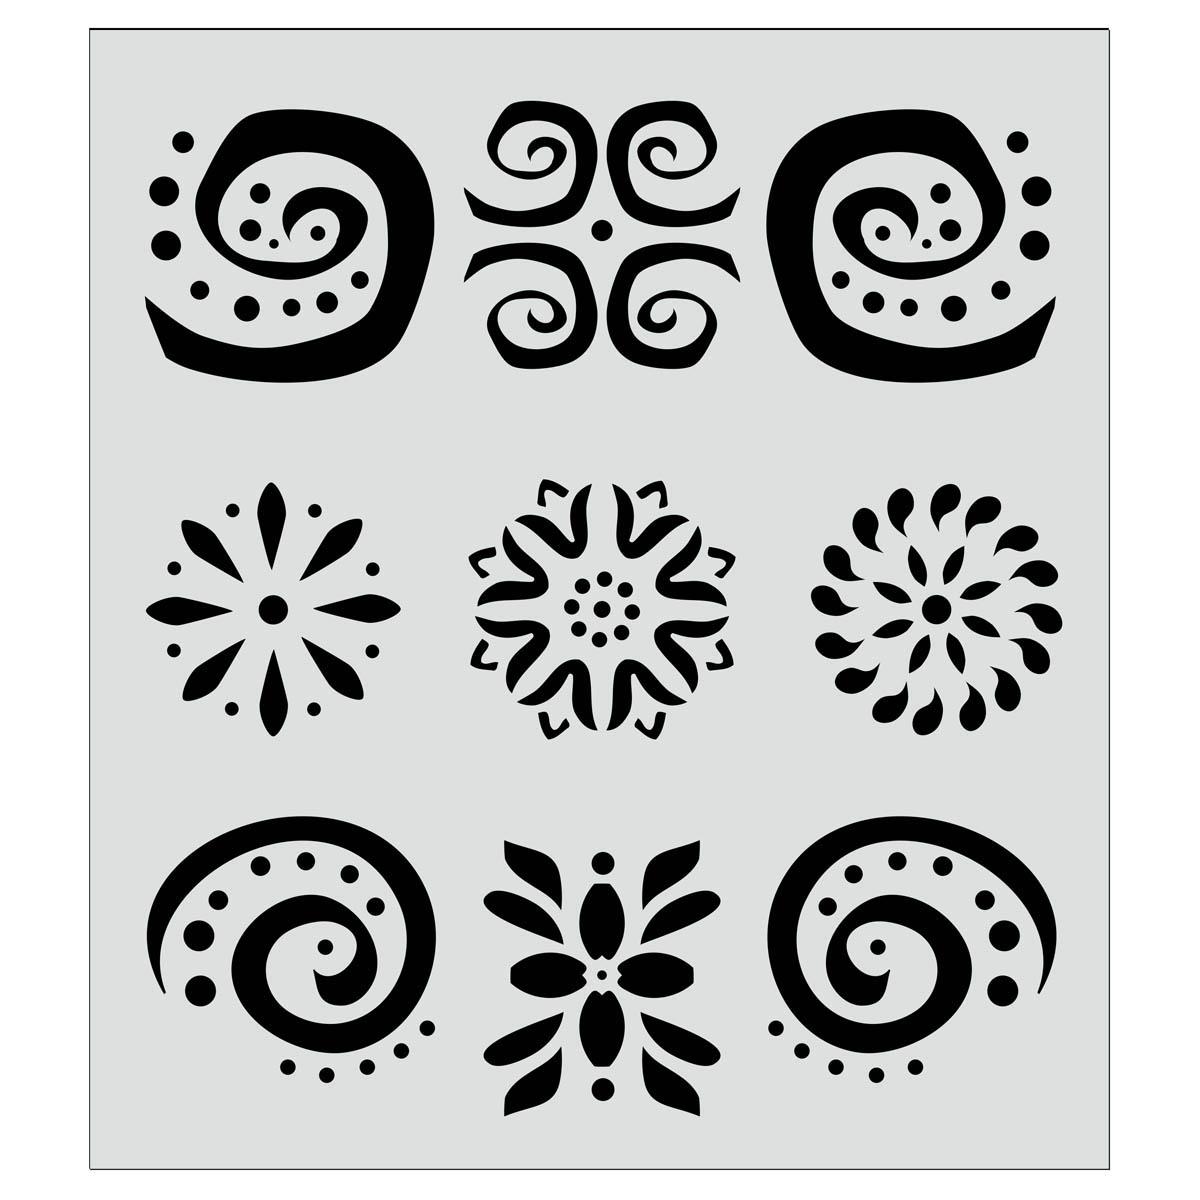 FolkArt ® Painting Stencils - Carribbean - 30735